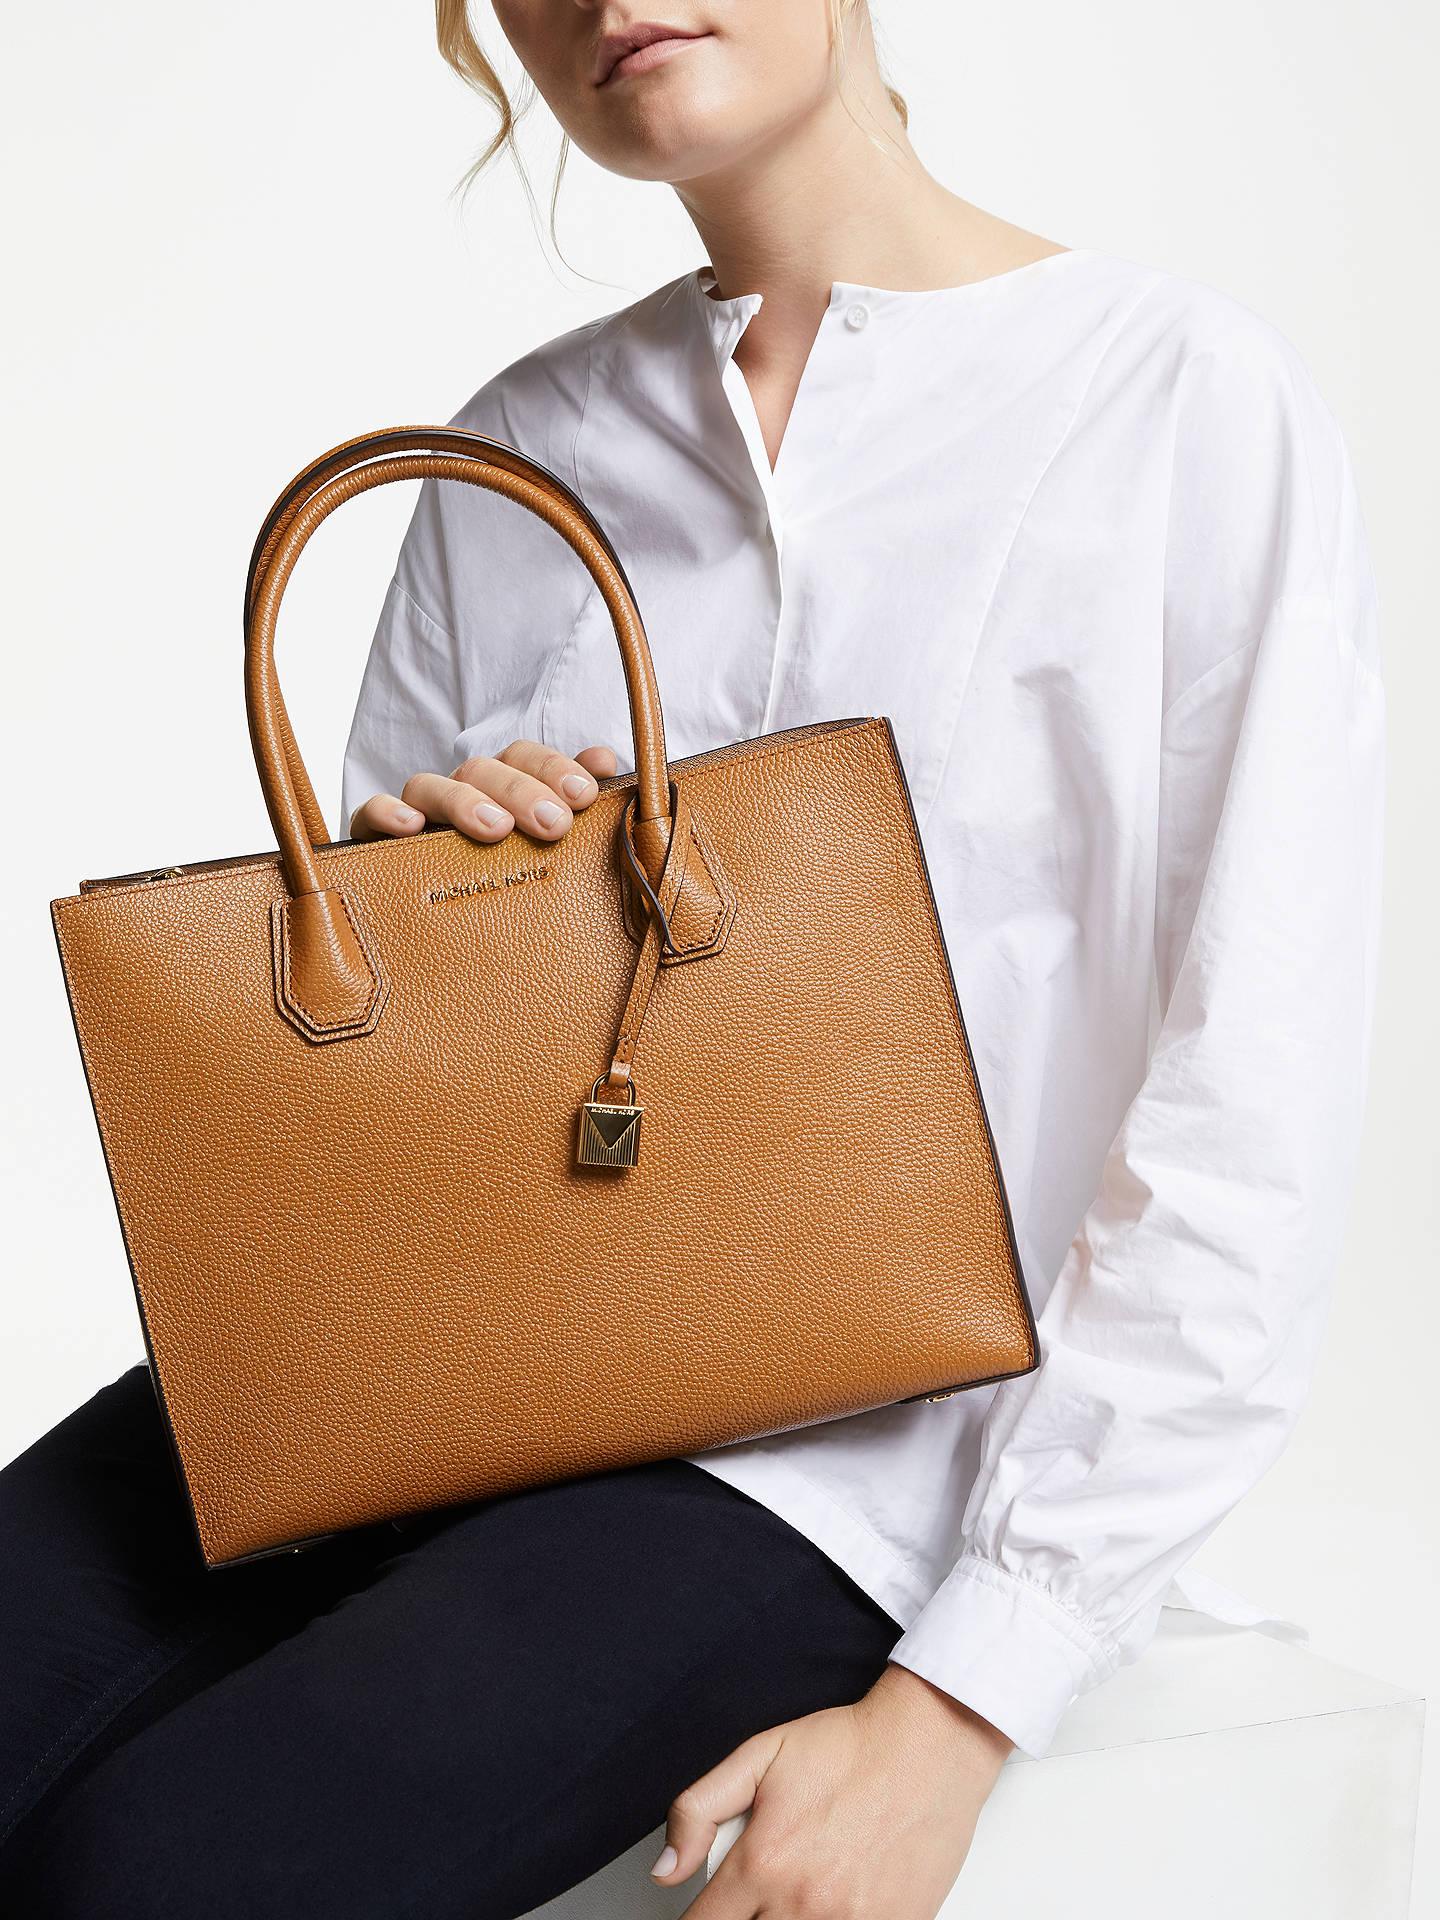 764fbdff0 ... Buy MICHAEL Michael Kors Mercer Large Leather Tote Bag, Acorn Online at  johnlewis.com ...